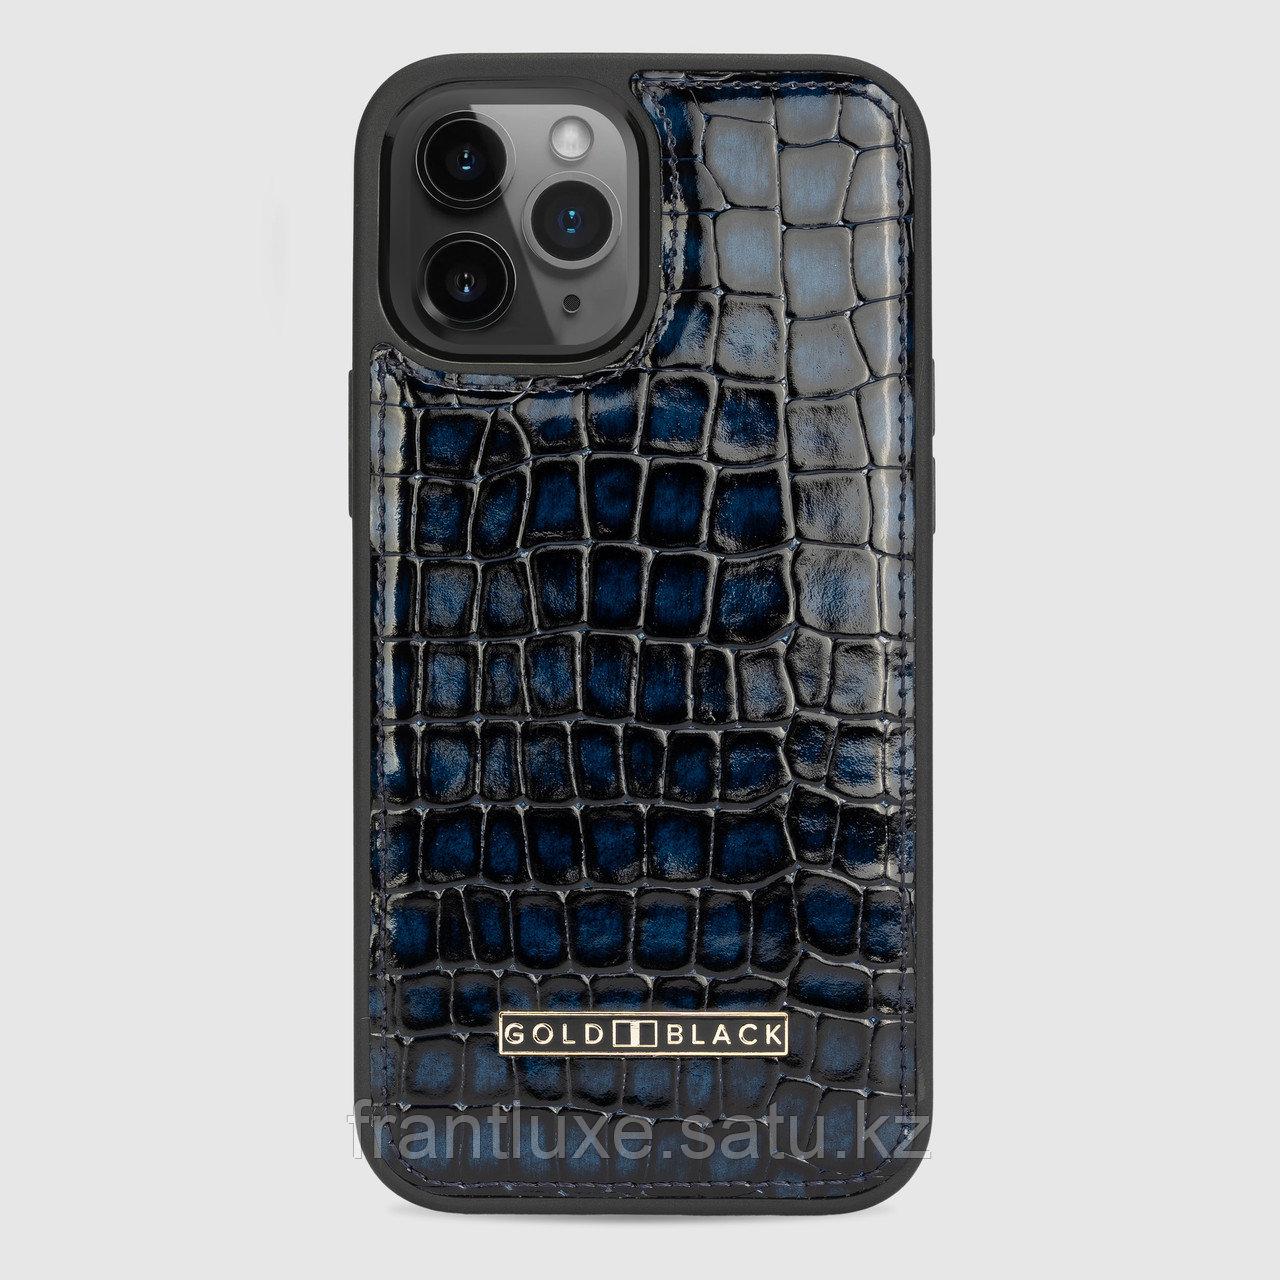 Чехол для телефона iPhone 12 Pro Max синий - фото 1